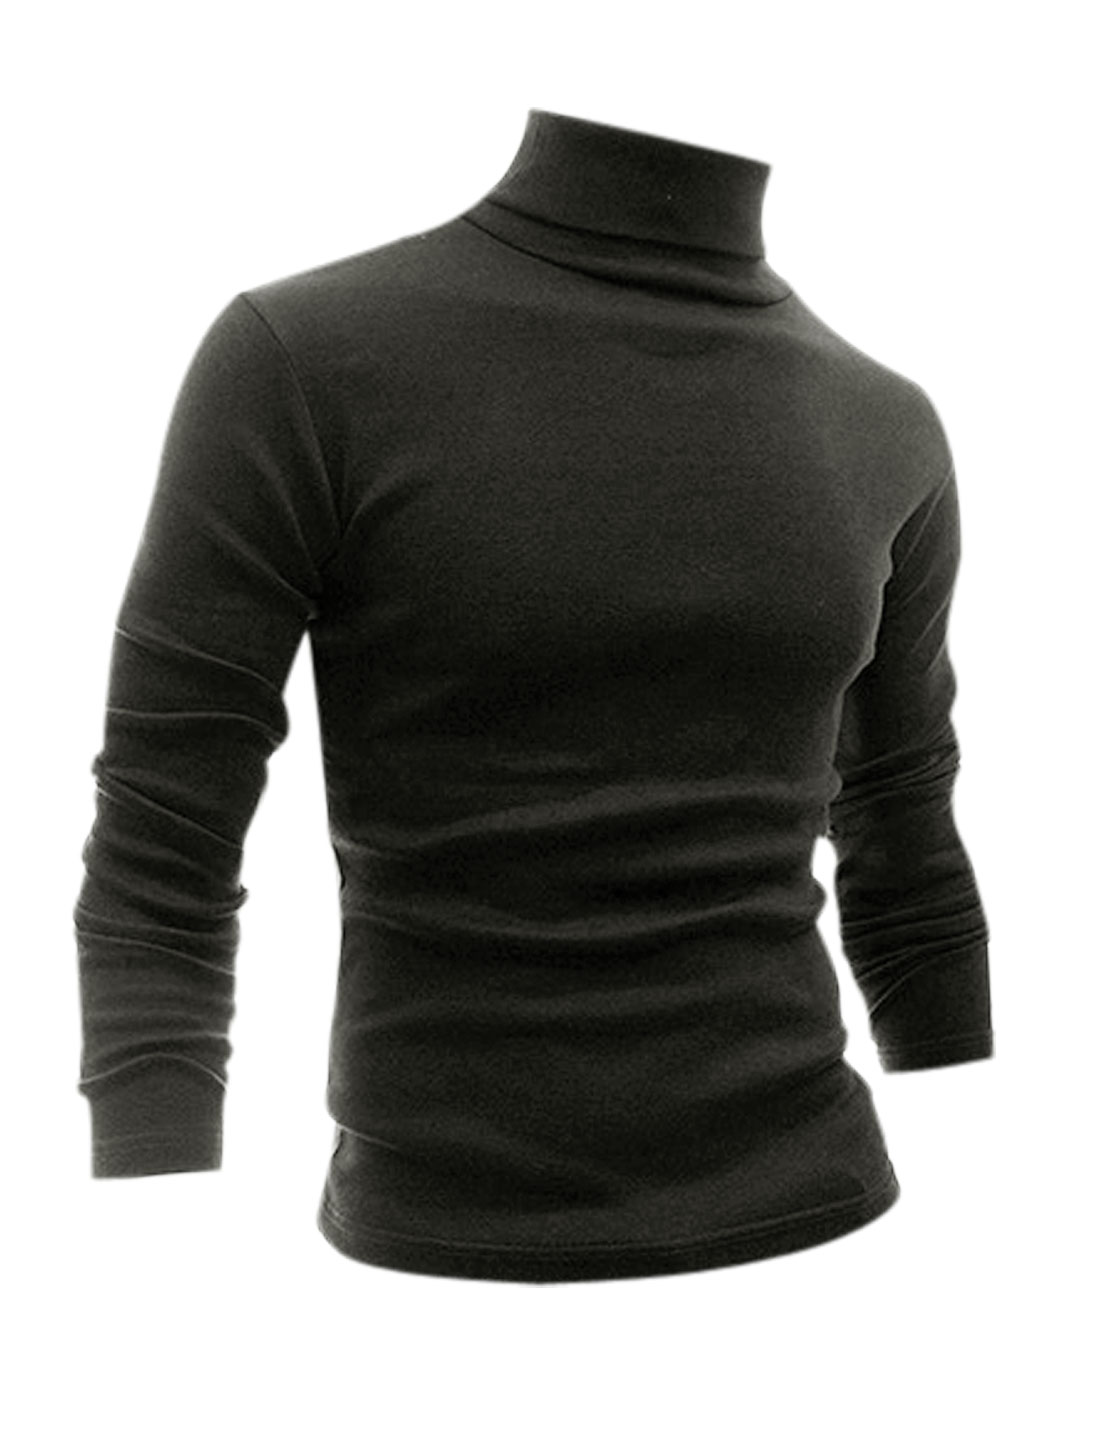 Men Slim Fit Turtle Neck Long Sleeves Design Shirt Dark Gray S